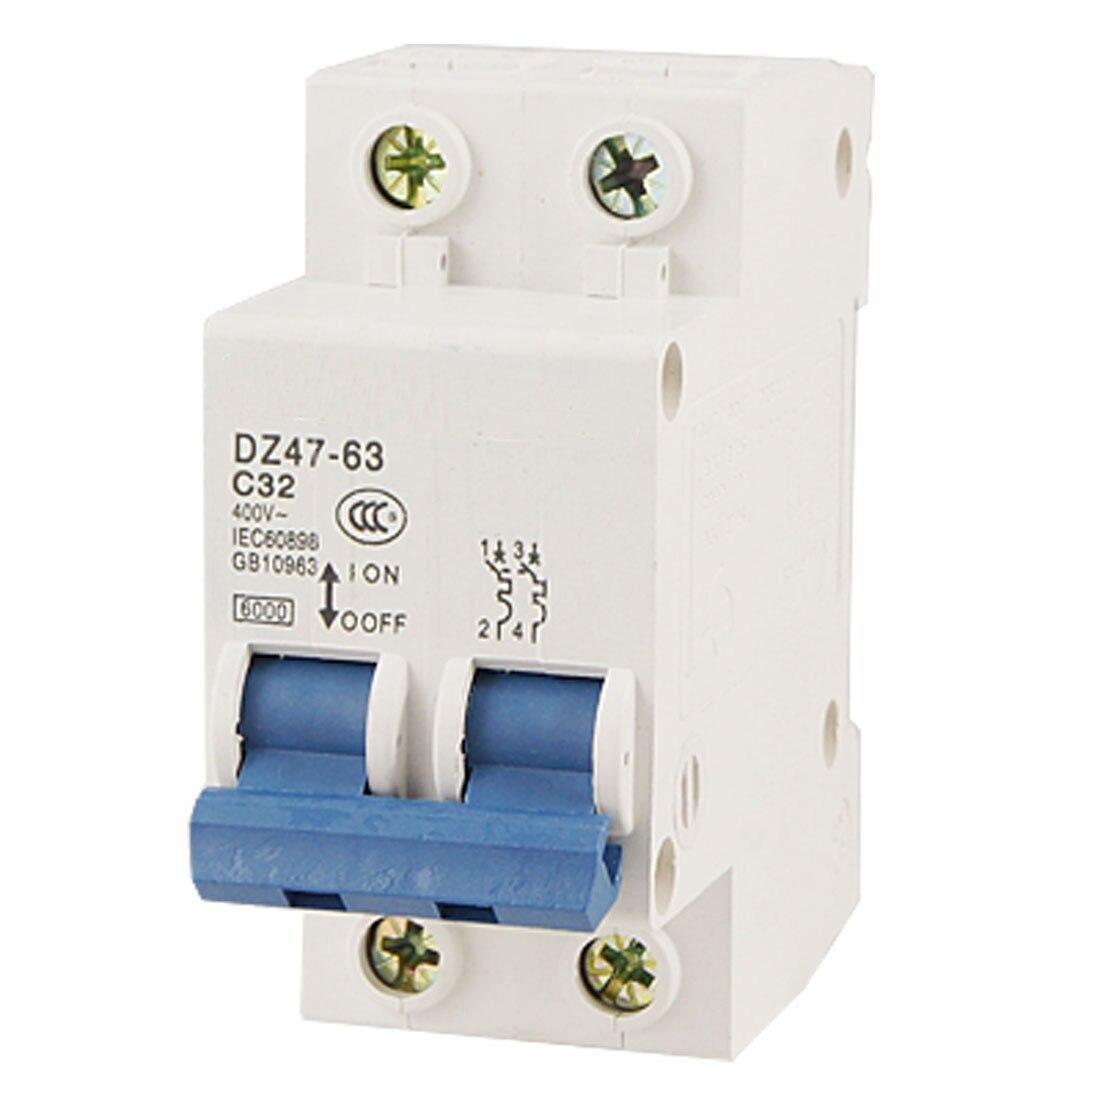 цена на DZ47-63 C32 AC 400V 32A 6000A 2 Poles DIN Rail Mount Miniature Circuit Breaker